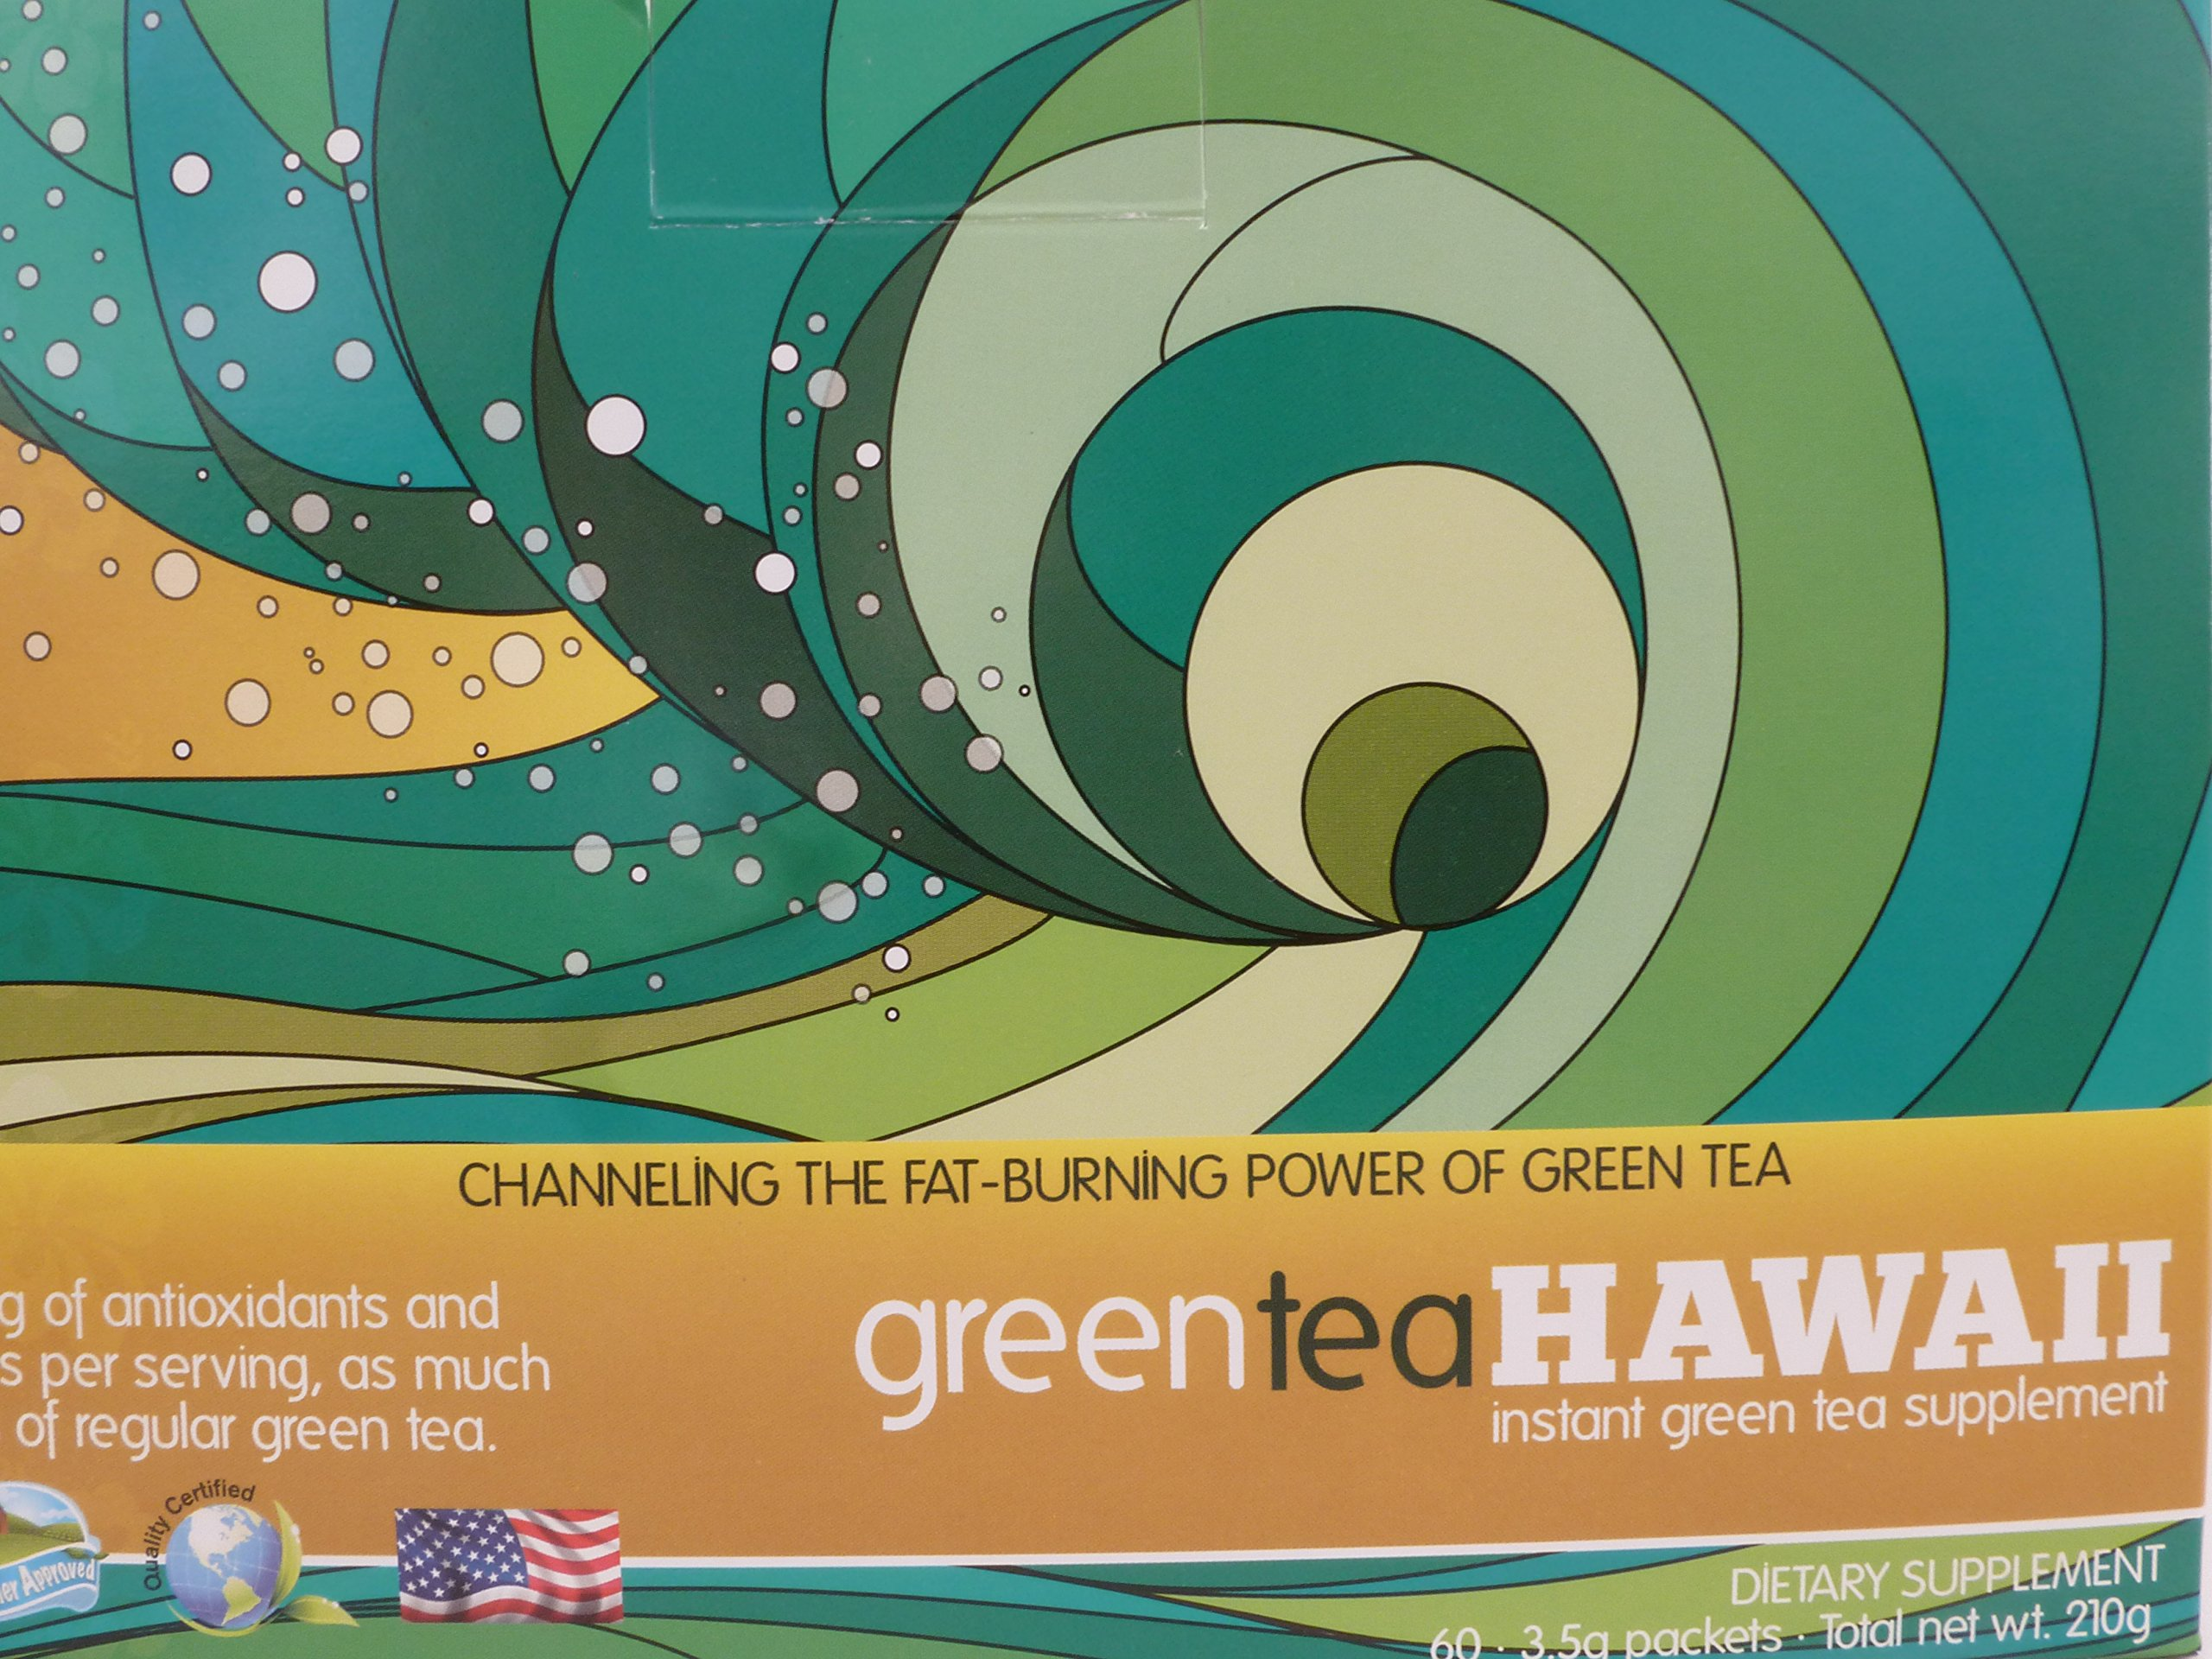 Green Tea Hawaii (Variety Pack) Powder with Noni, 60 Packets, 540 mg of Antioxidants/Polyphenols, All Natural by greenteaHAWAII (Image #1)